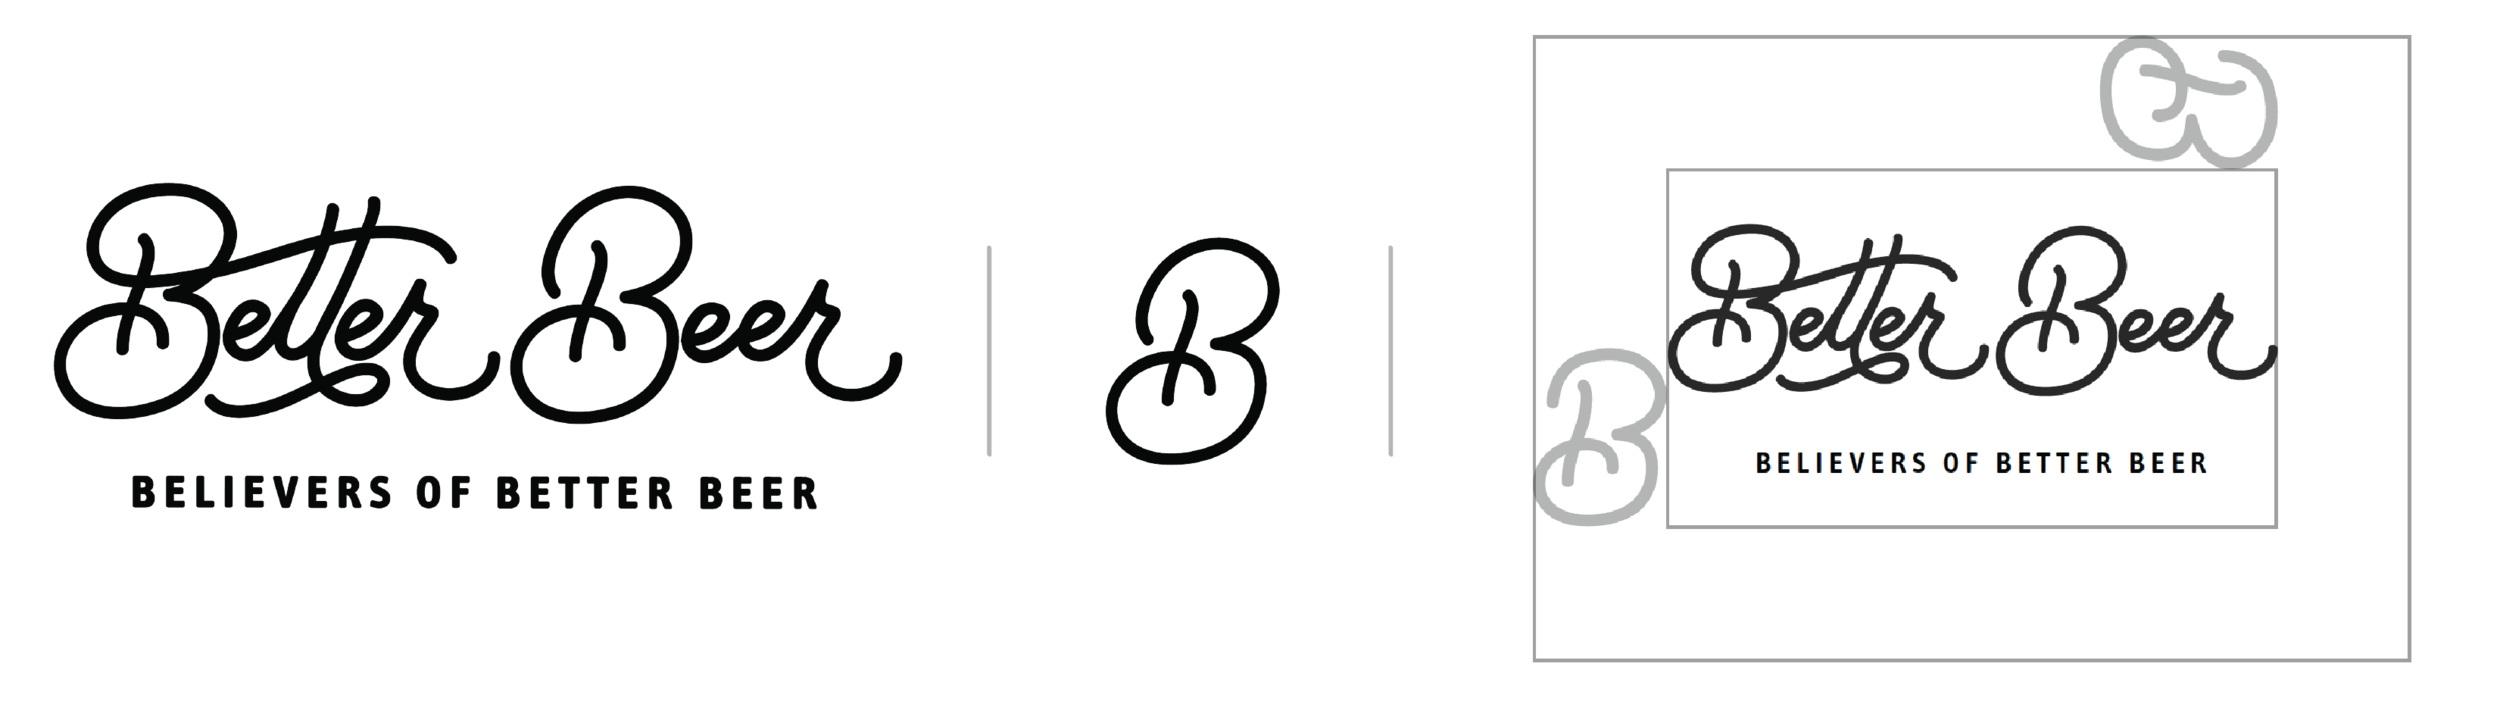 Logo_Styles-03.jpg